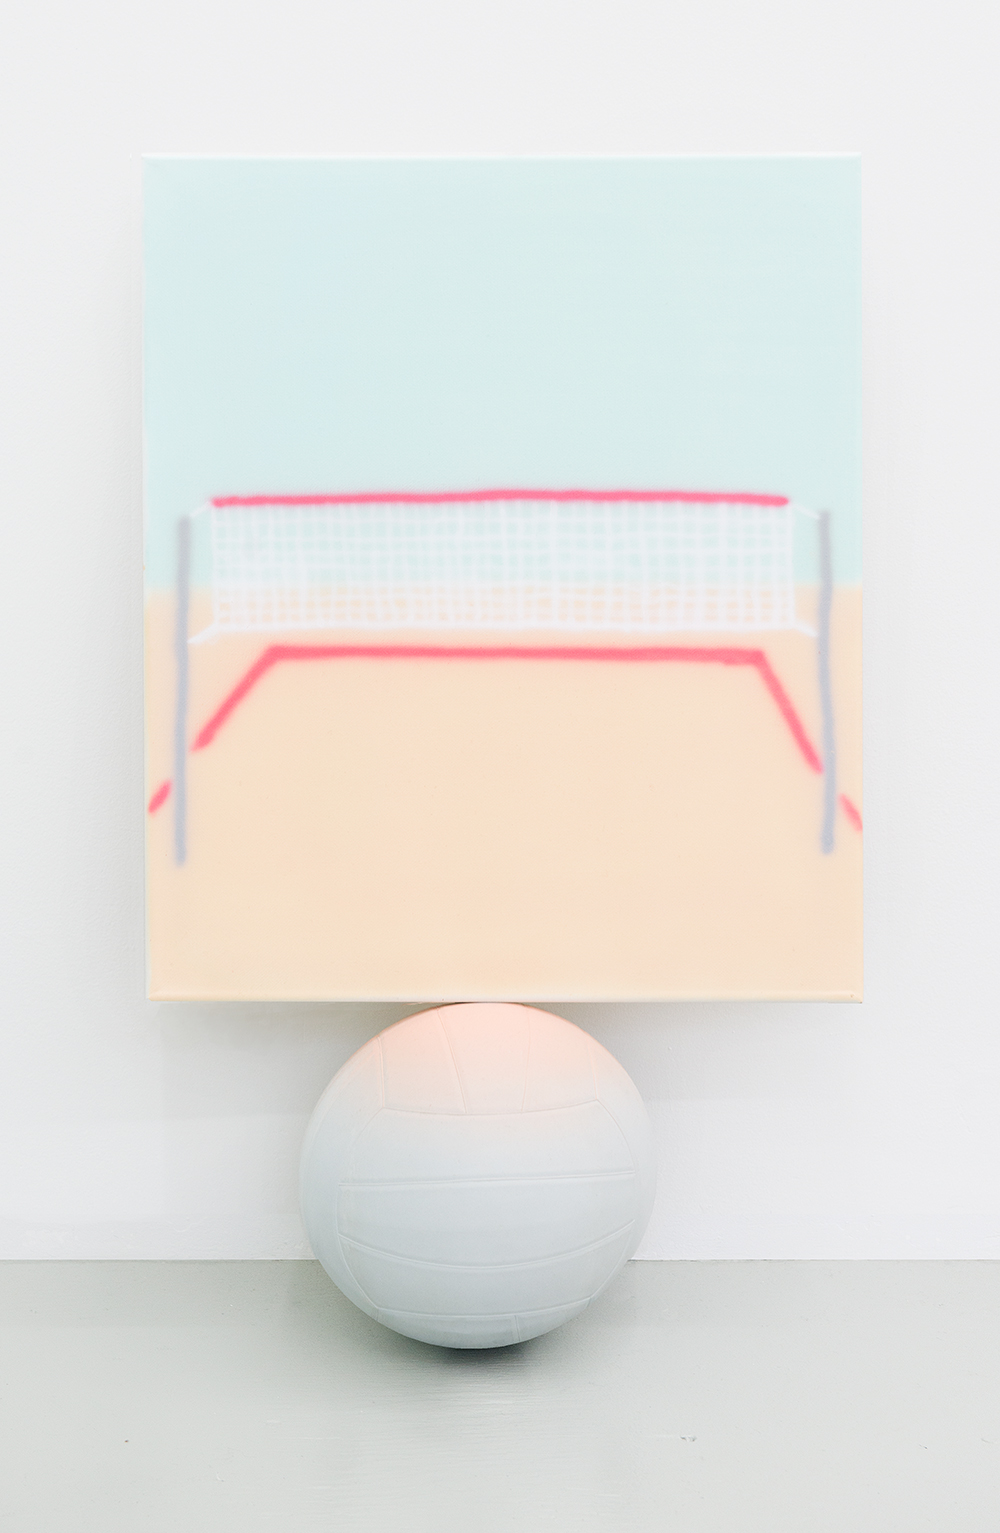 Jonny Paul Gillette Goal on volleyball ball, 2015 Acrylic polymer on canvas, volleyball  2015